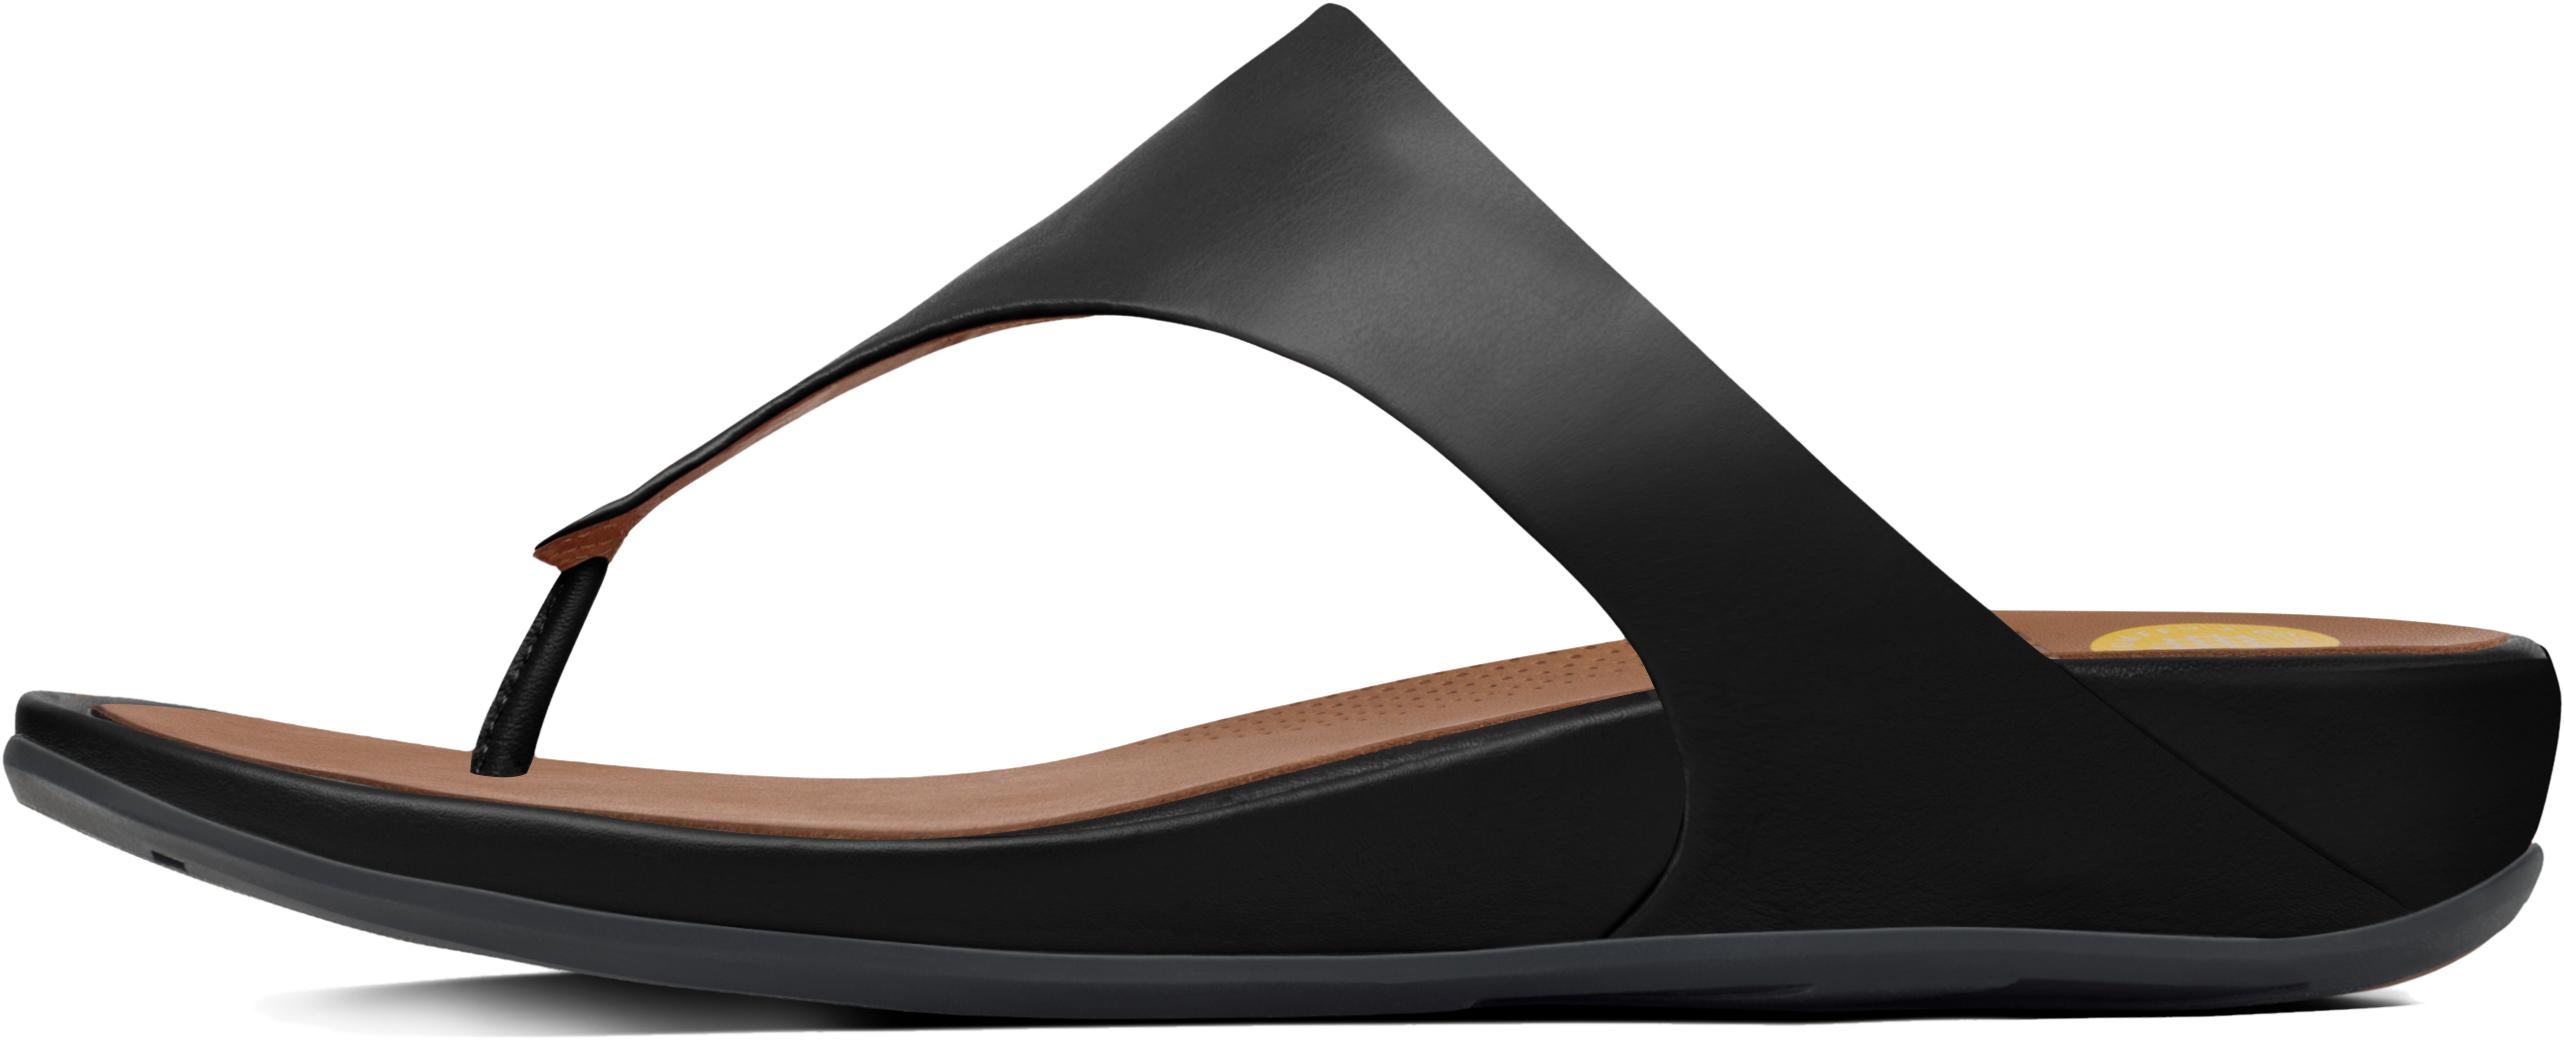 New Sandal Elegant Women's silver Black Banda Fitflop EqtwII